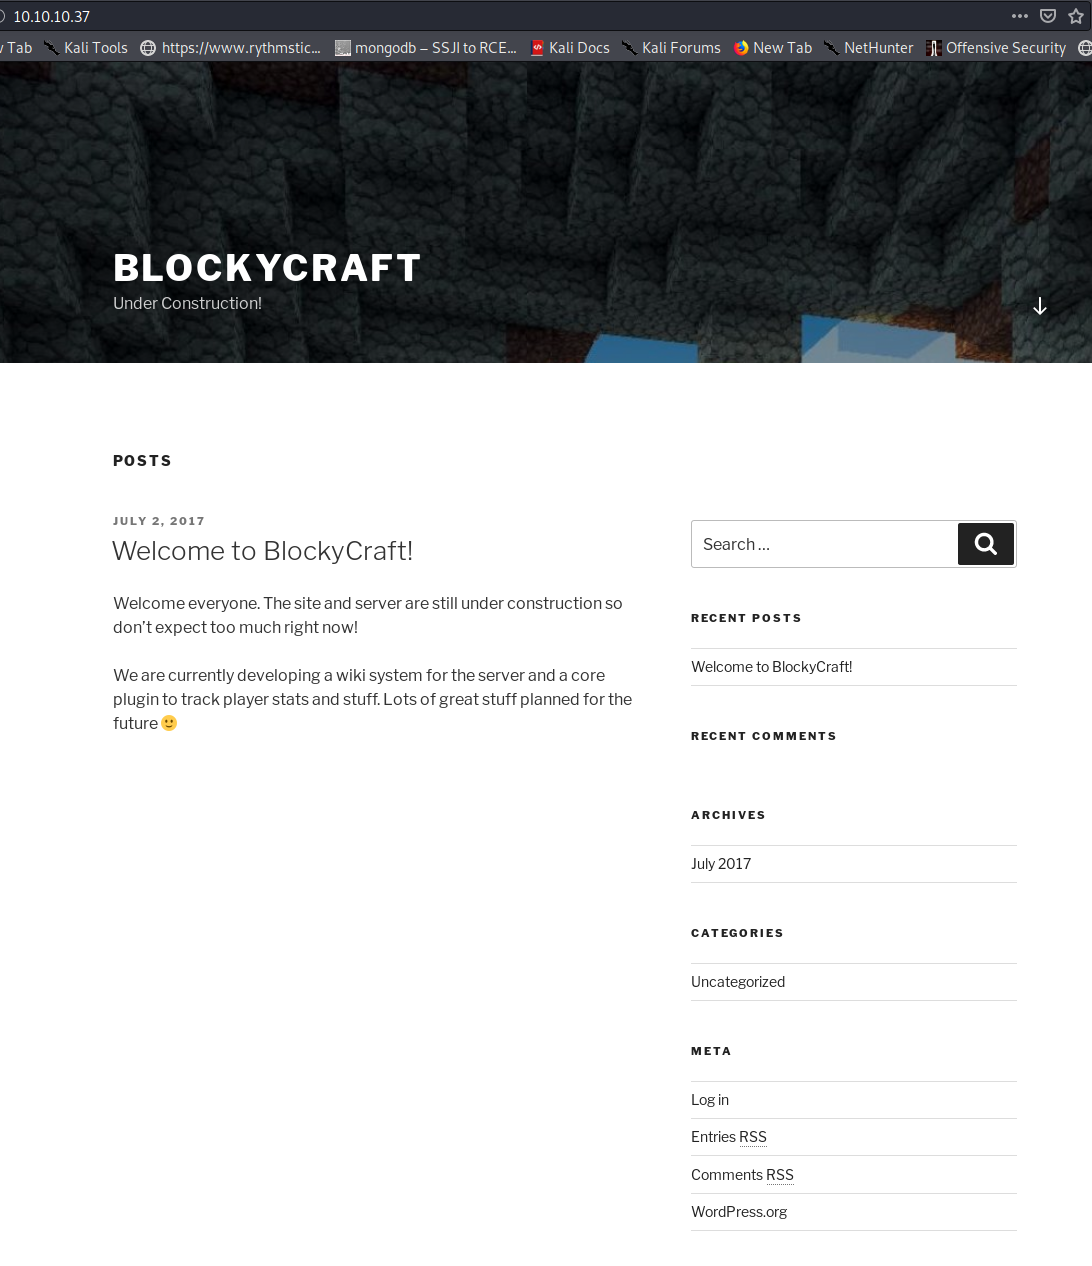 BlockyCraft Index page